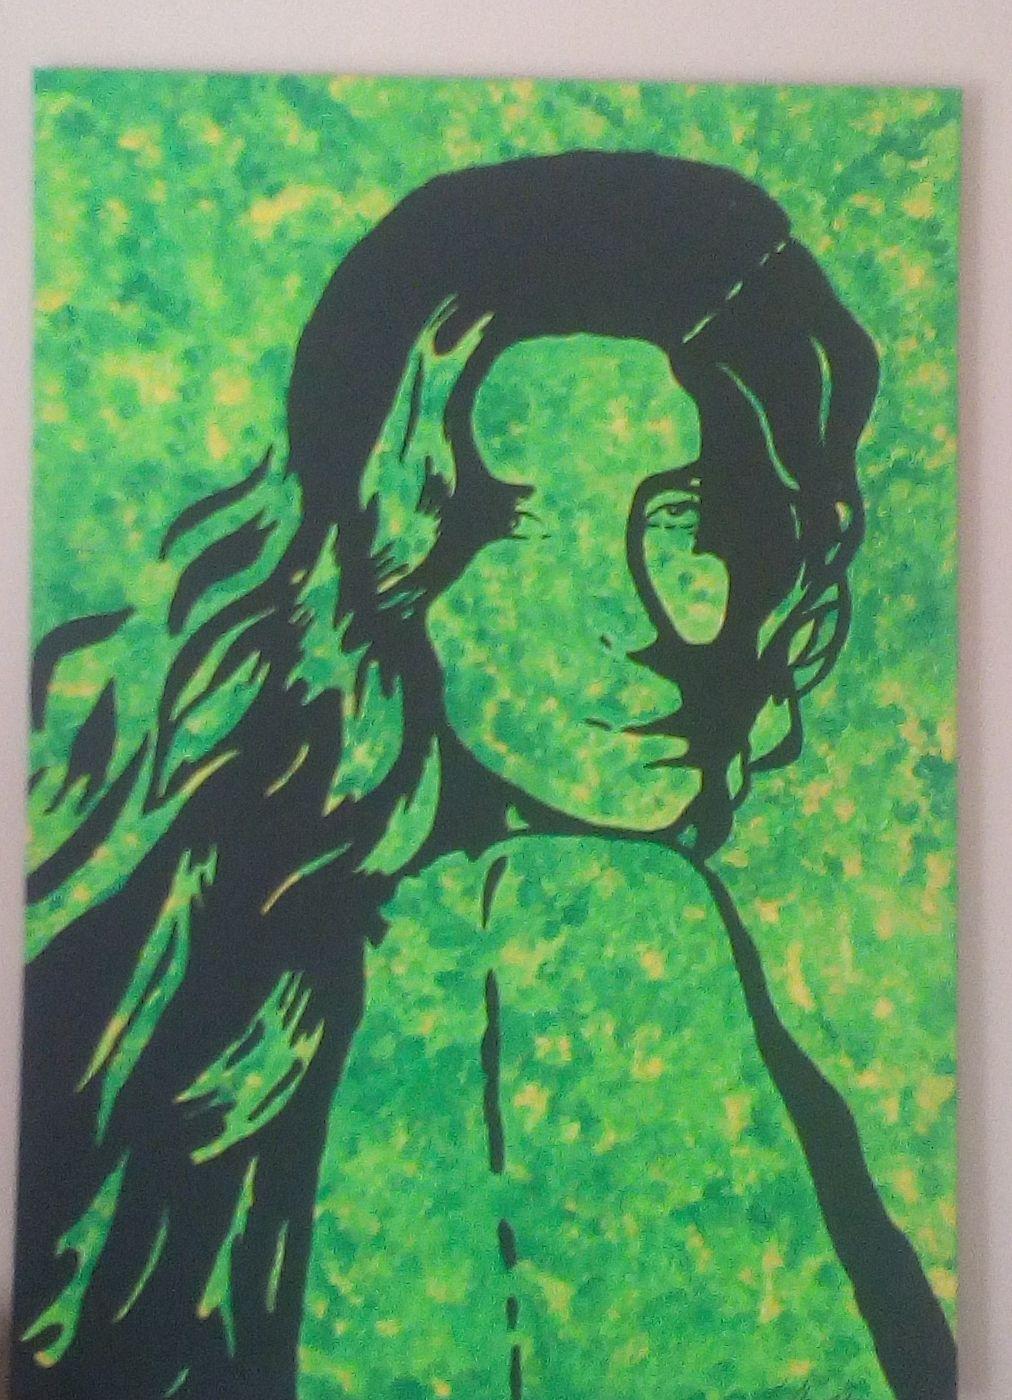 Kareena Kapoor, Grün, Zweifarbigkeit, Acrylmalerei